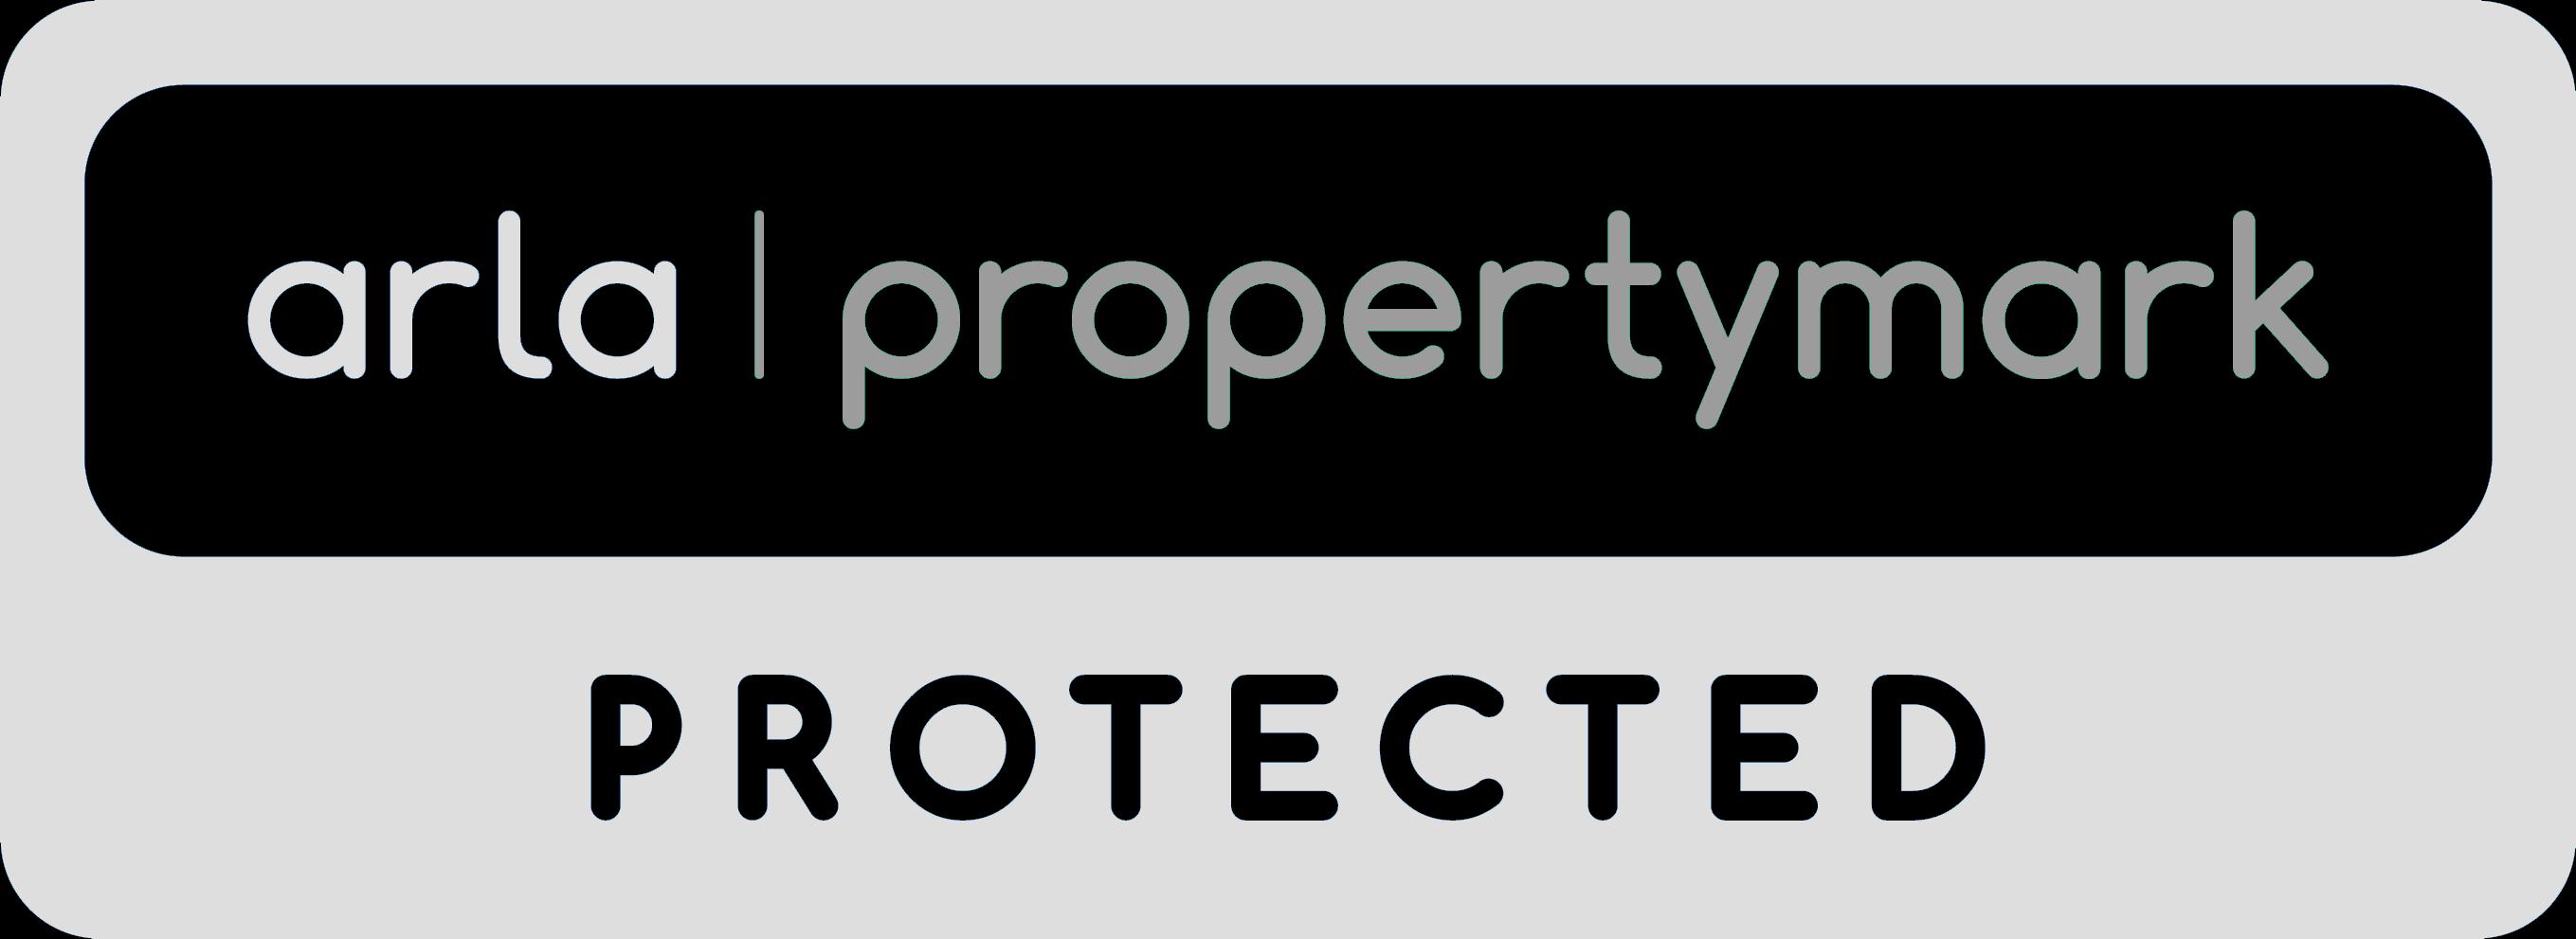 ARLA Propertymark Protected